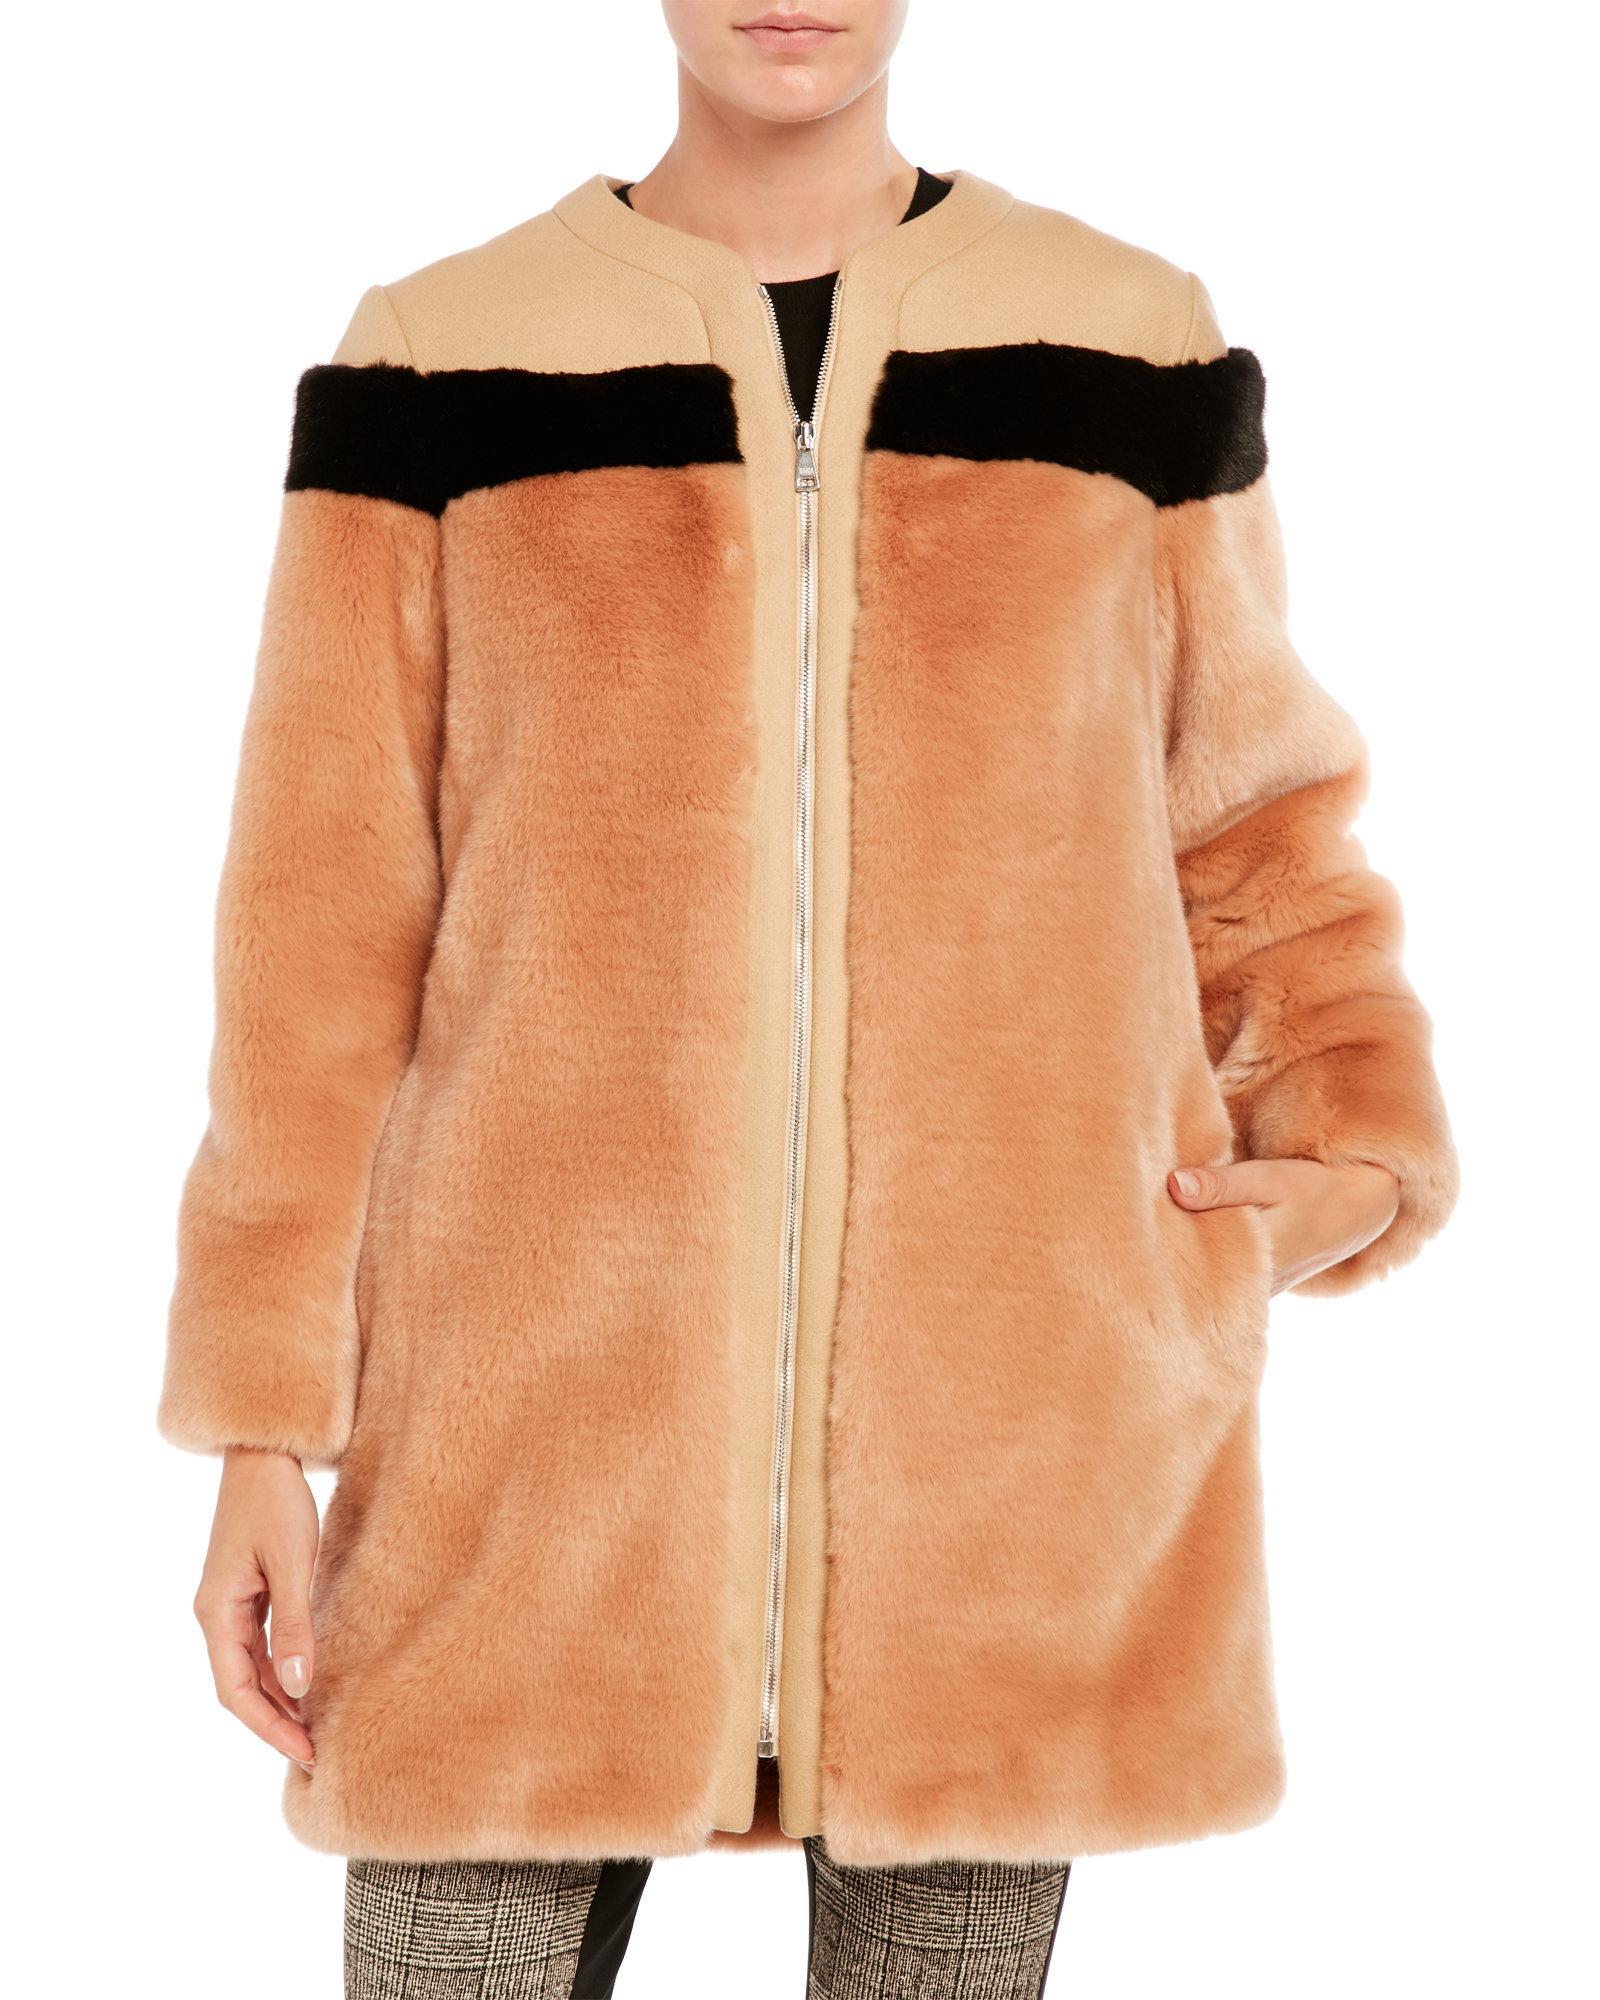 Lyst - Sonia by Sonia Rykiel Faux Fur Coat in Black 50f1255968294